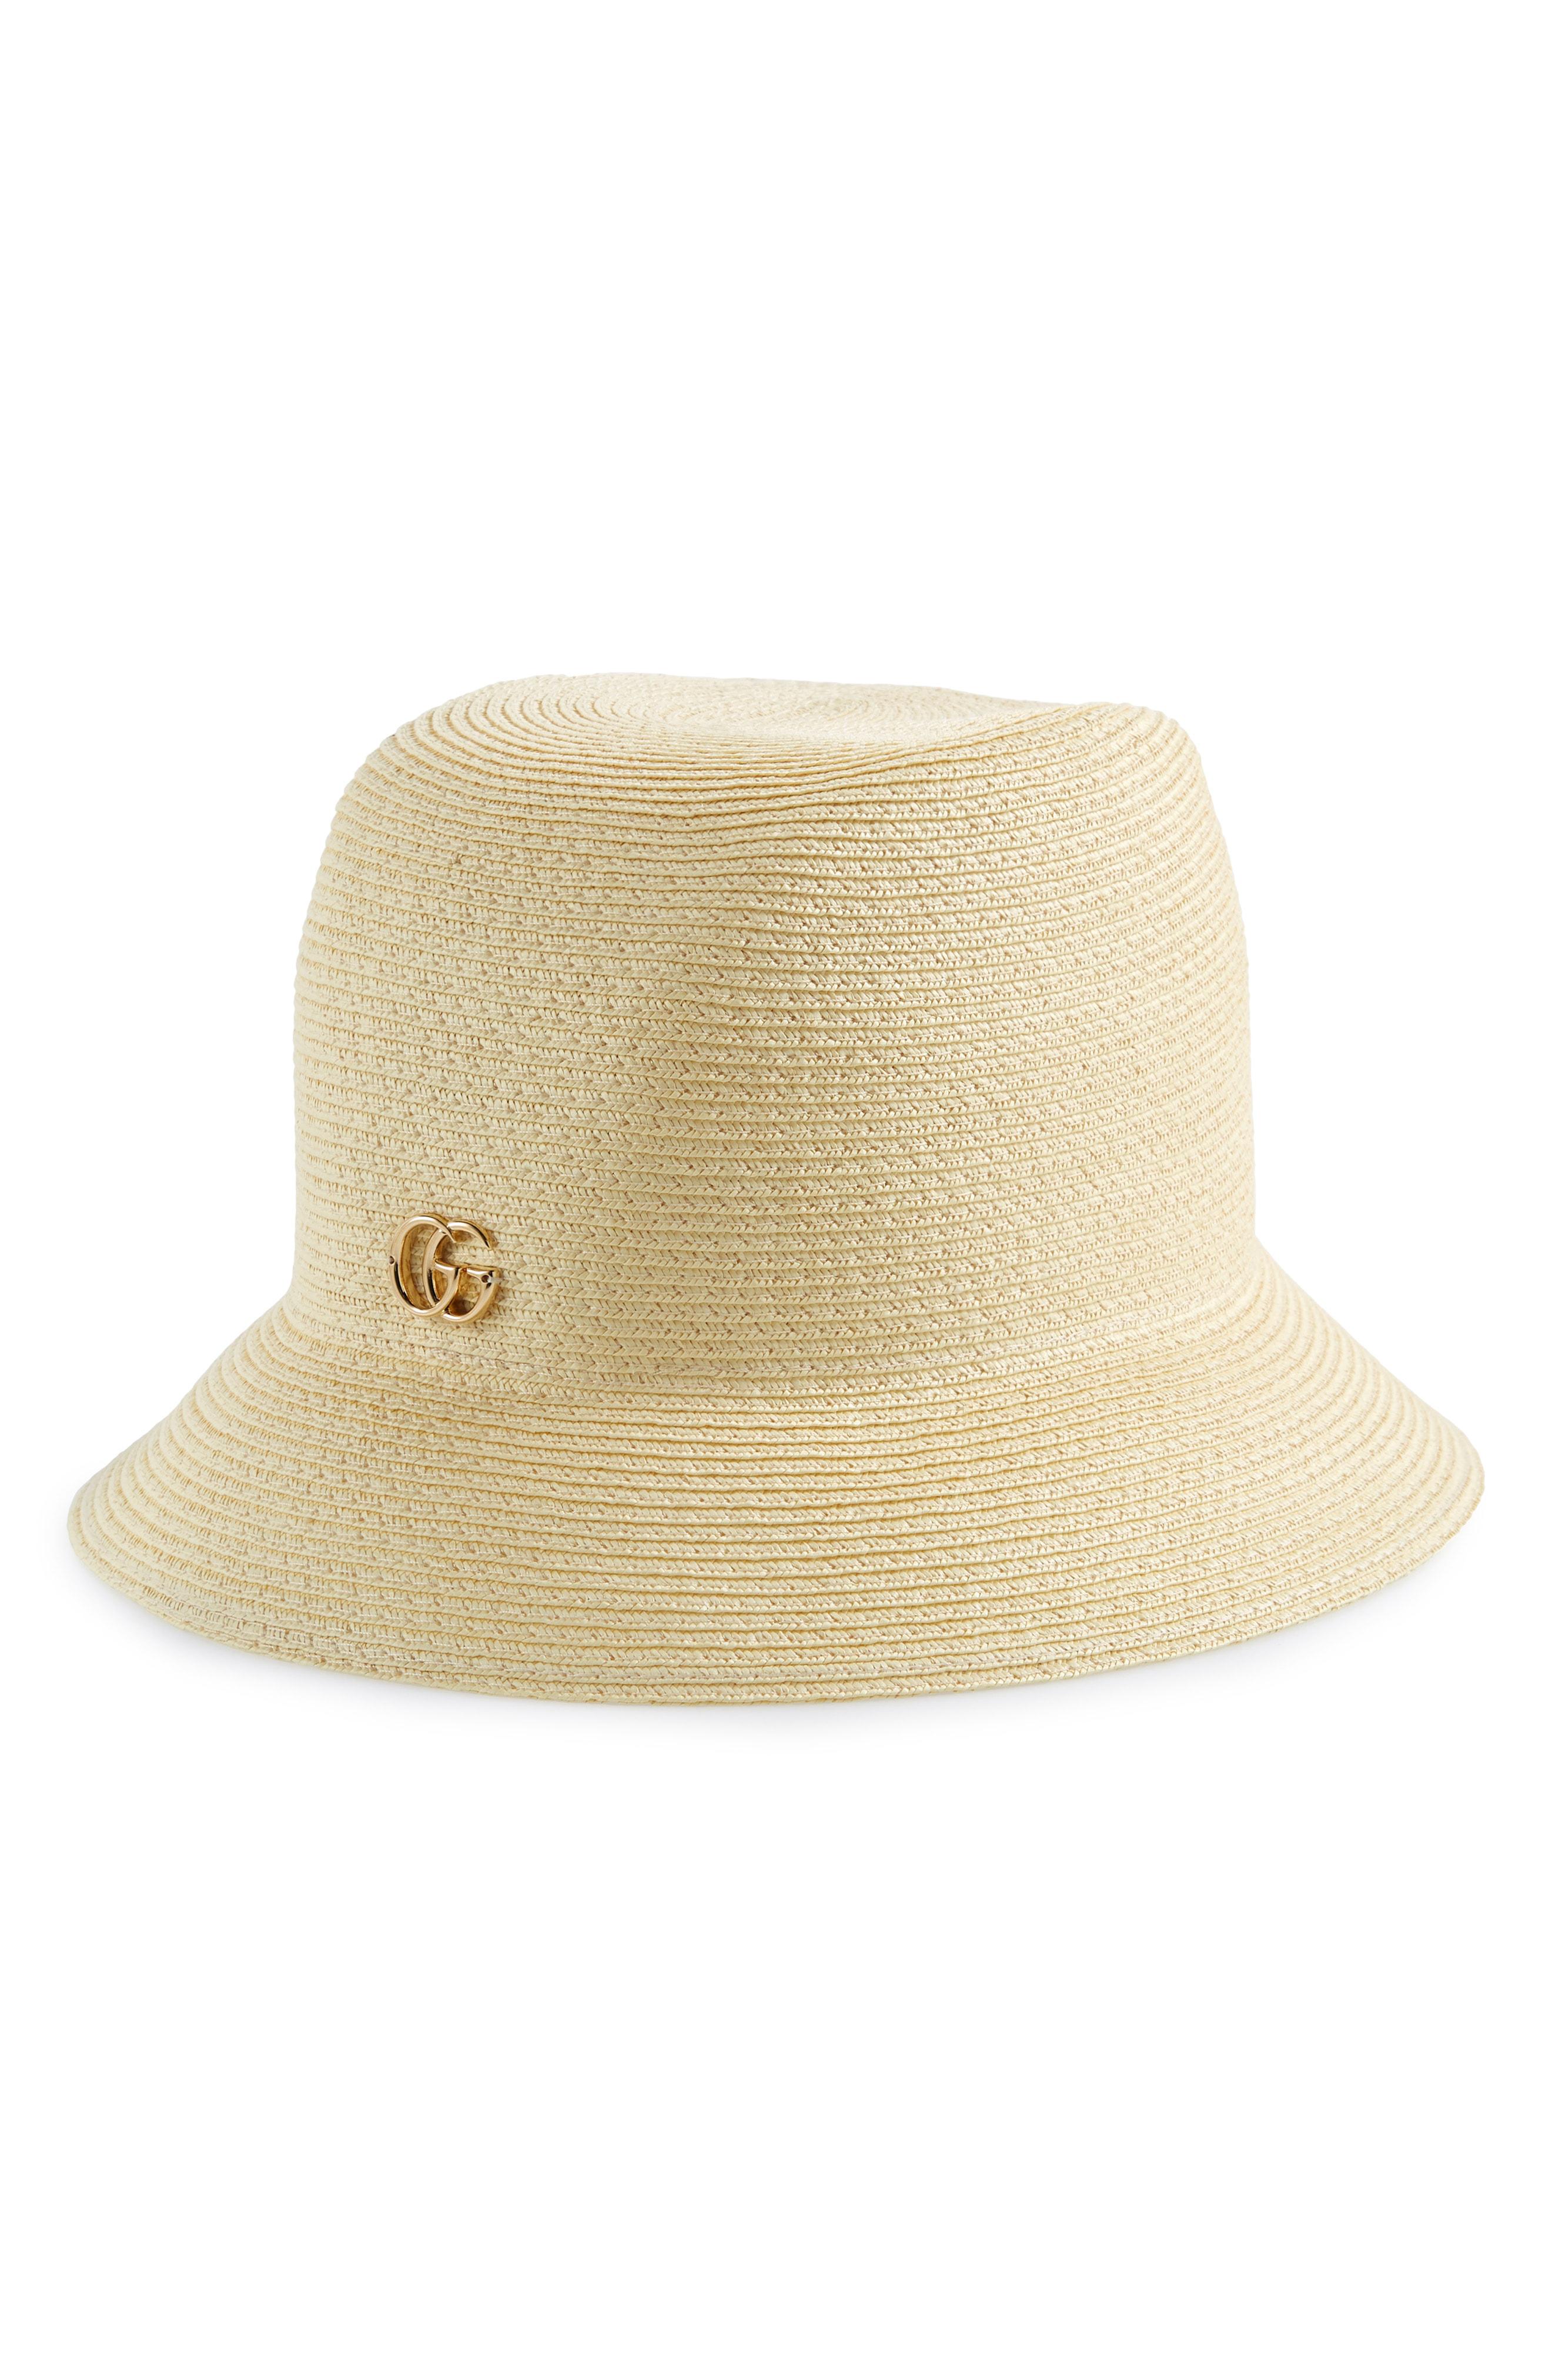 4b2668d8142 Gucci Wide Brim Woven Hat W  Double G Hardware In 9200 Beige